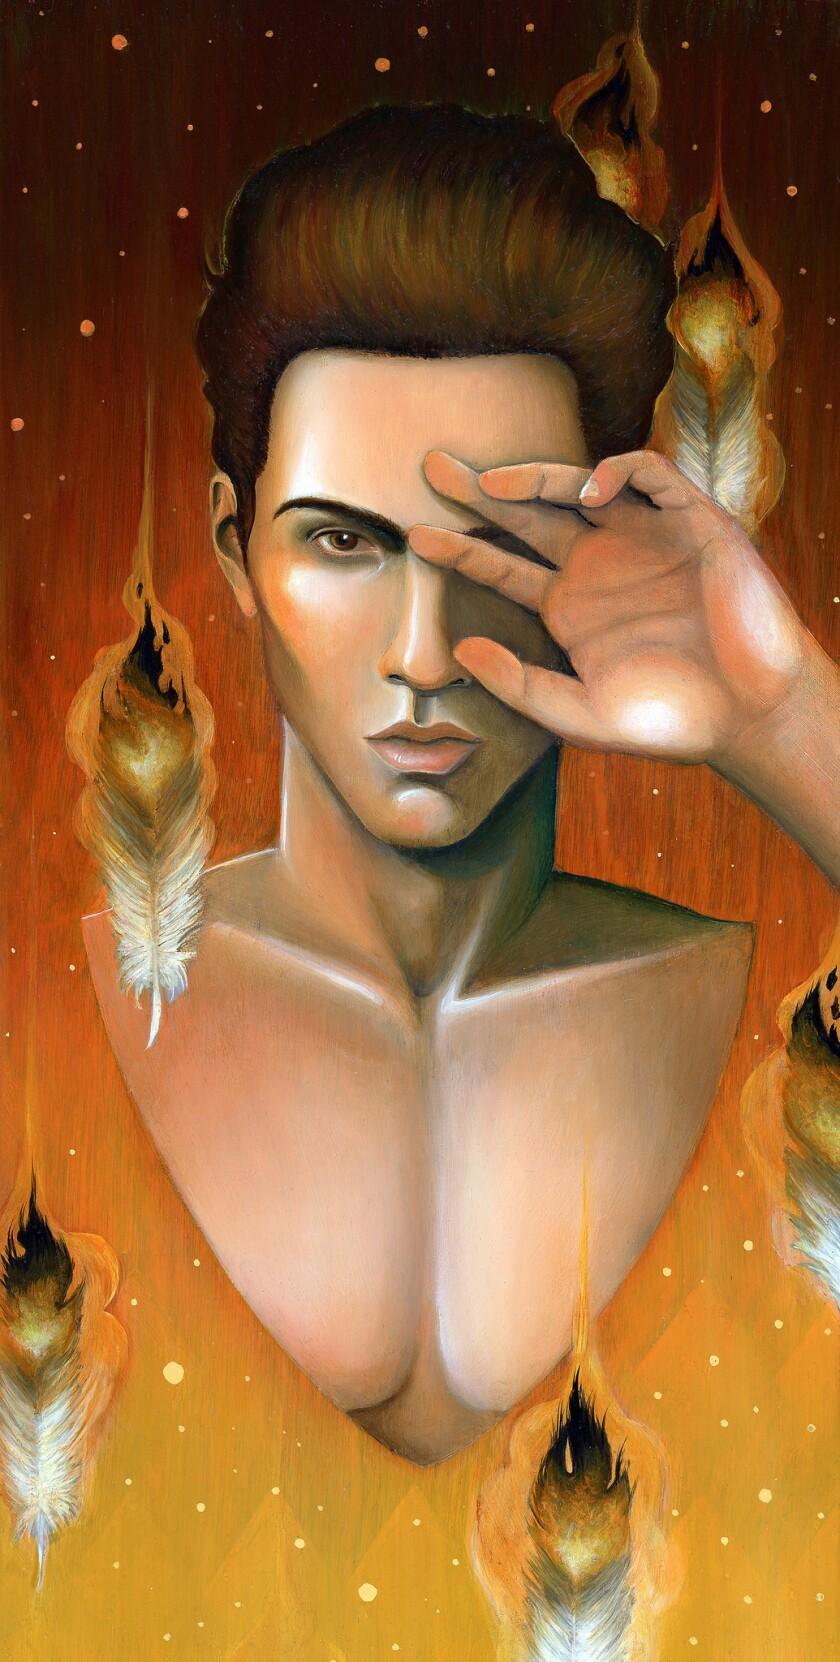 """Icarus"" by David Camisa."